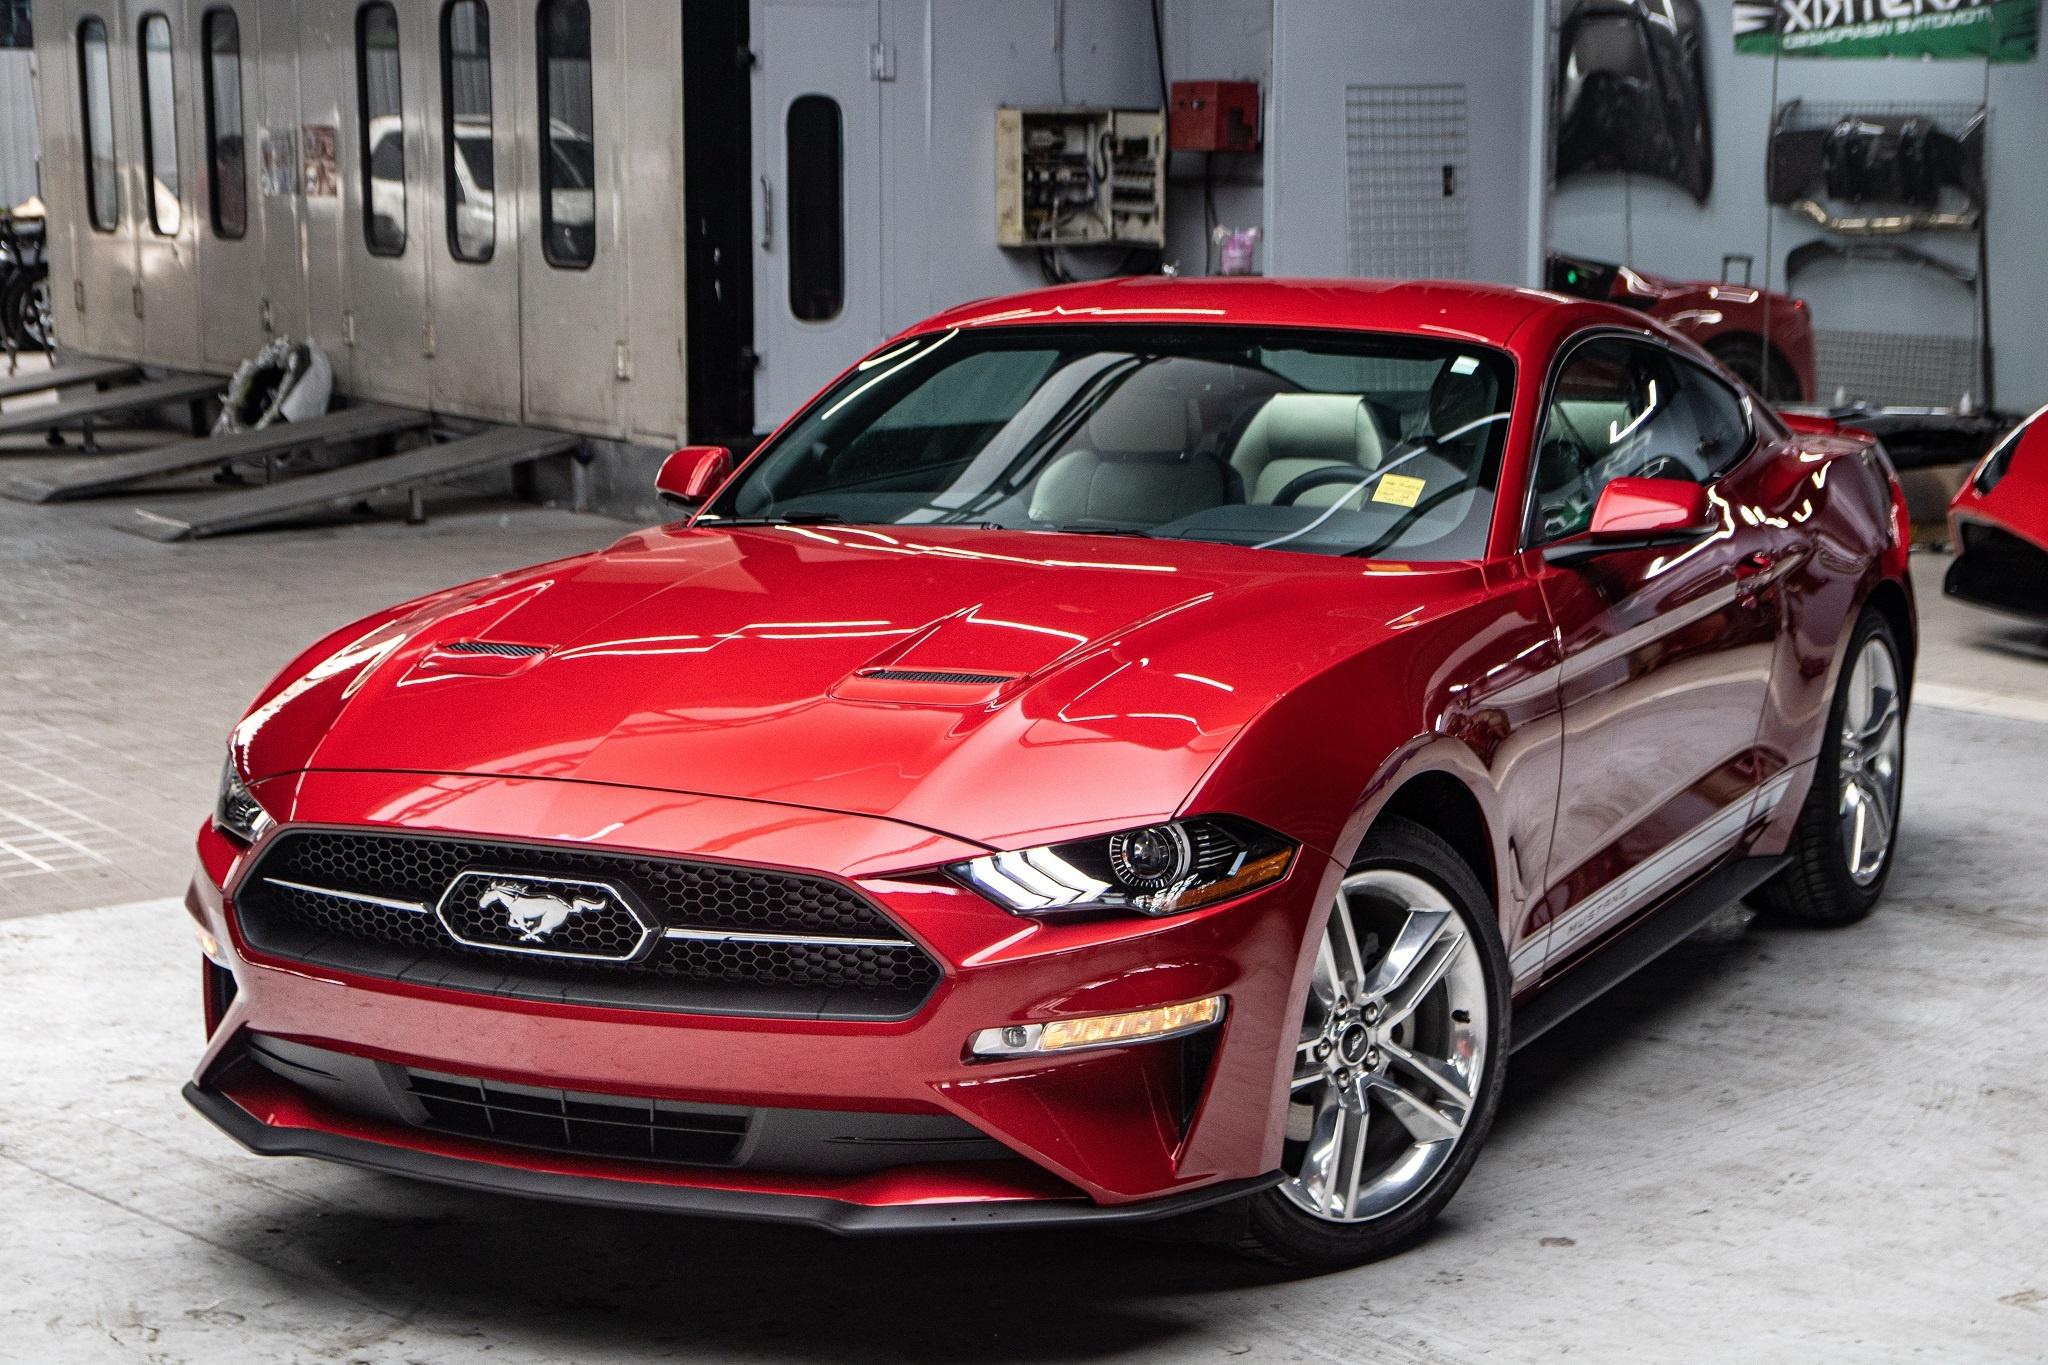 Ford Mustang 2020 phien ban ky niem vua ve VN, gia hon 3 ty hinh anh 42 Mustang_55_edition_zing_8_.jpg